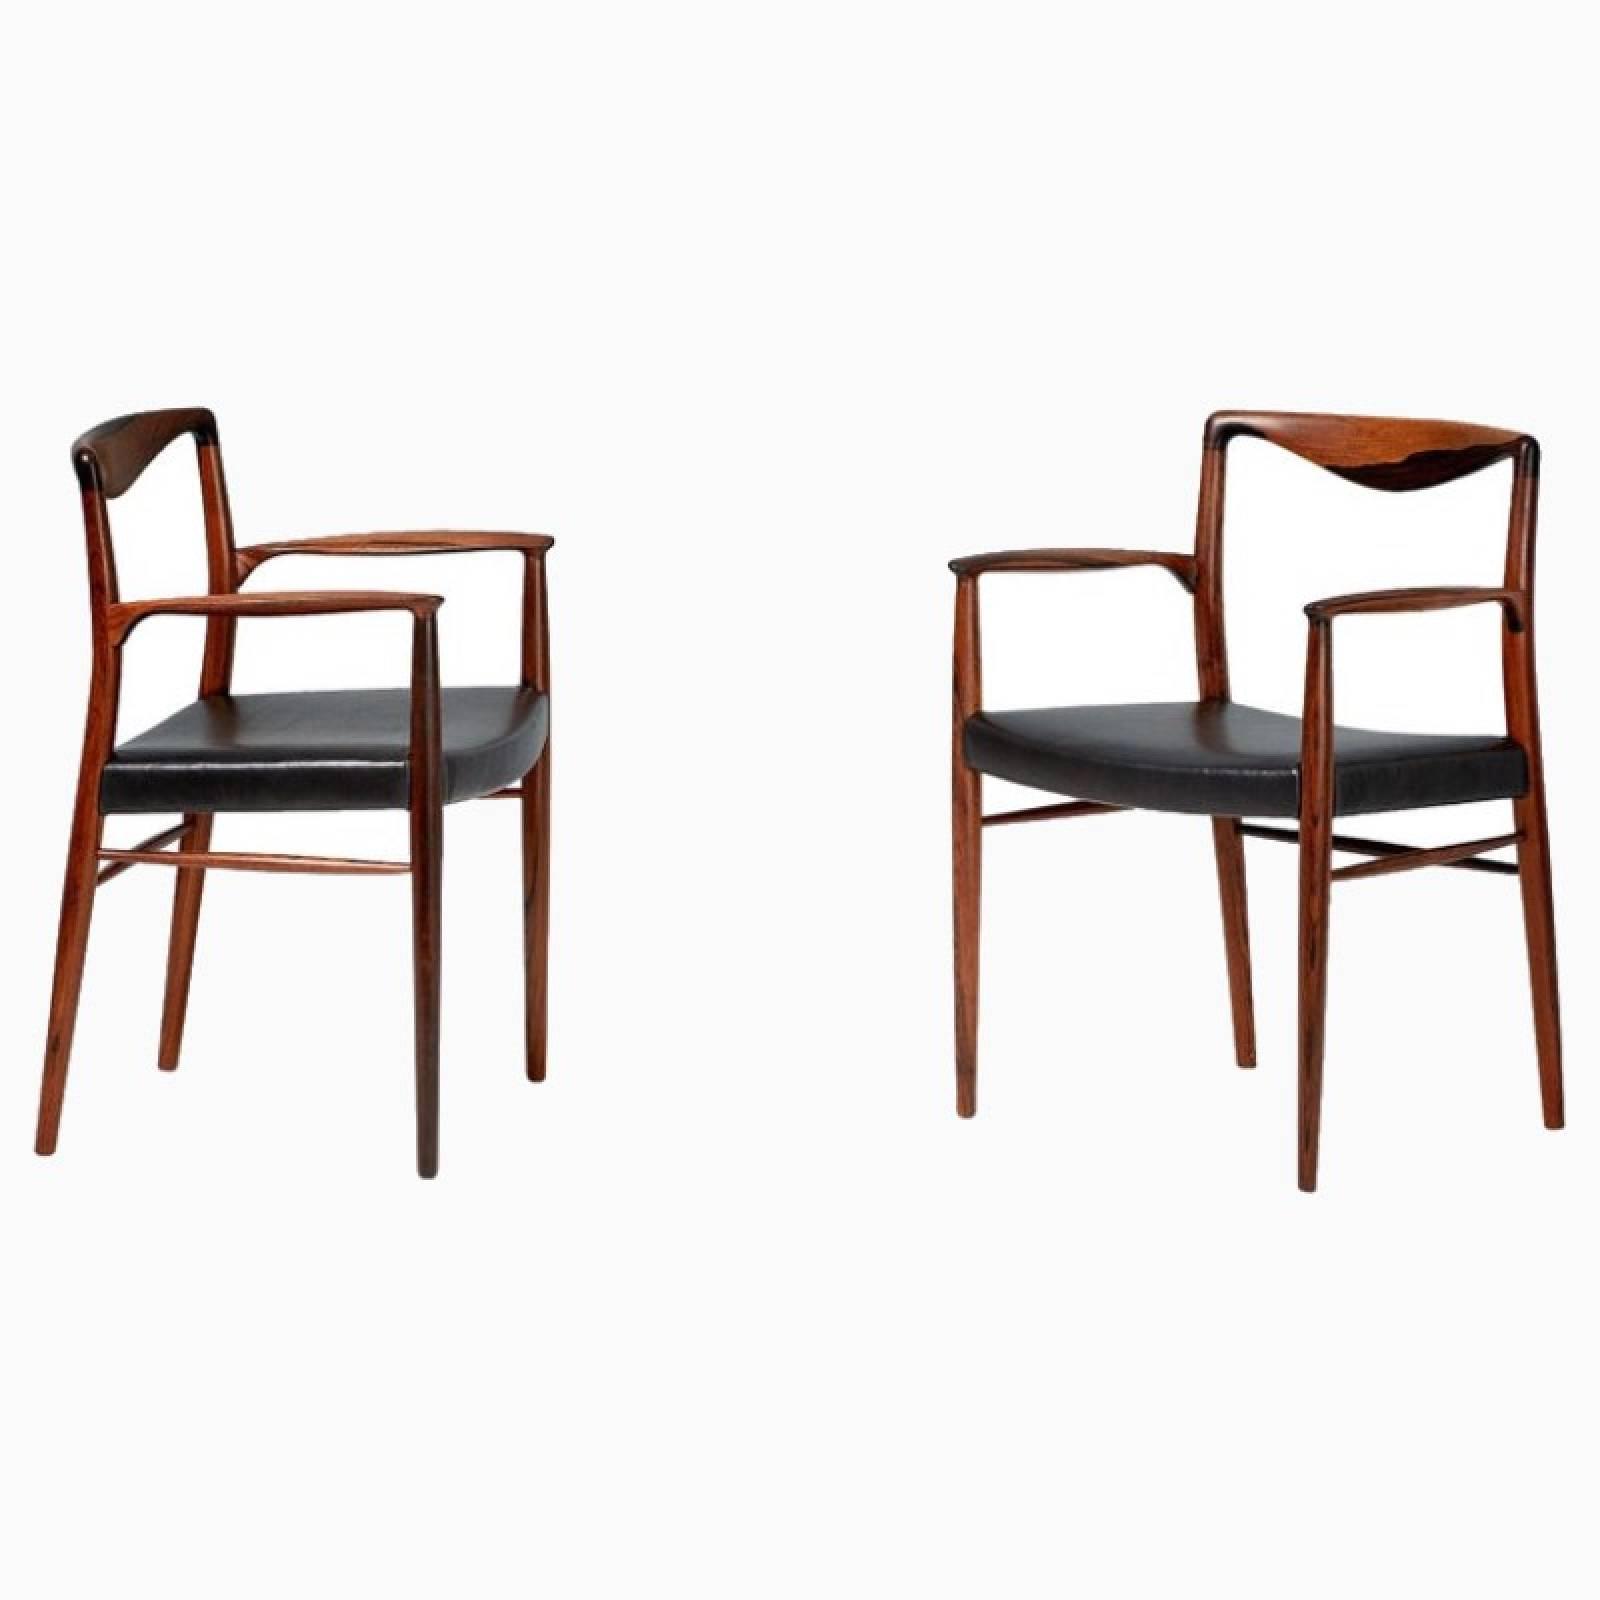 Pair Of 1960s Rosewood Chairs By Kai Lyngfeldt Larsen